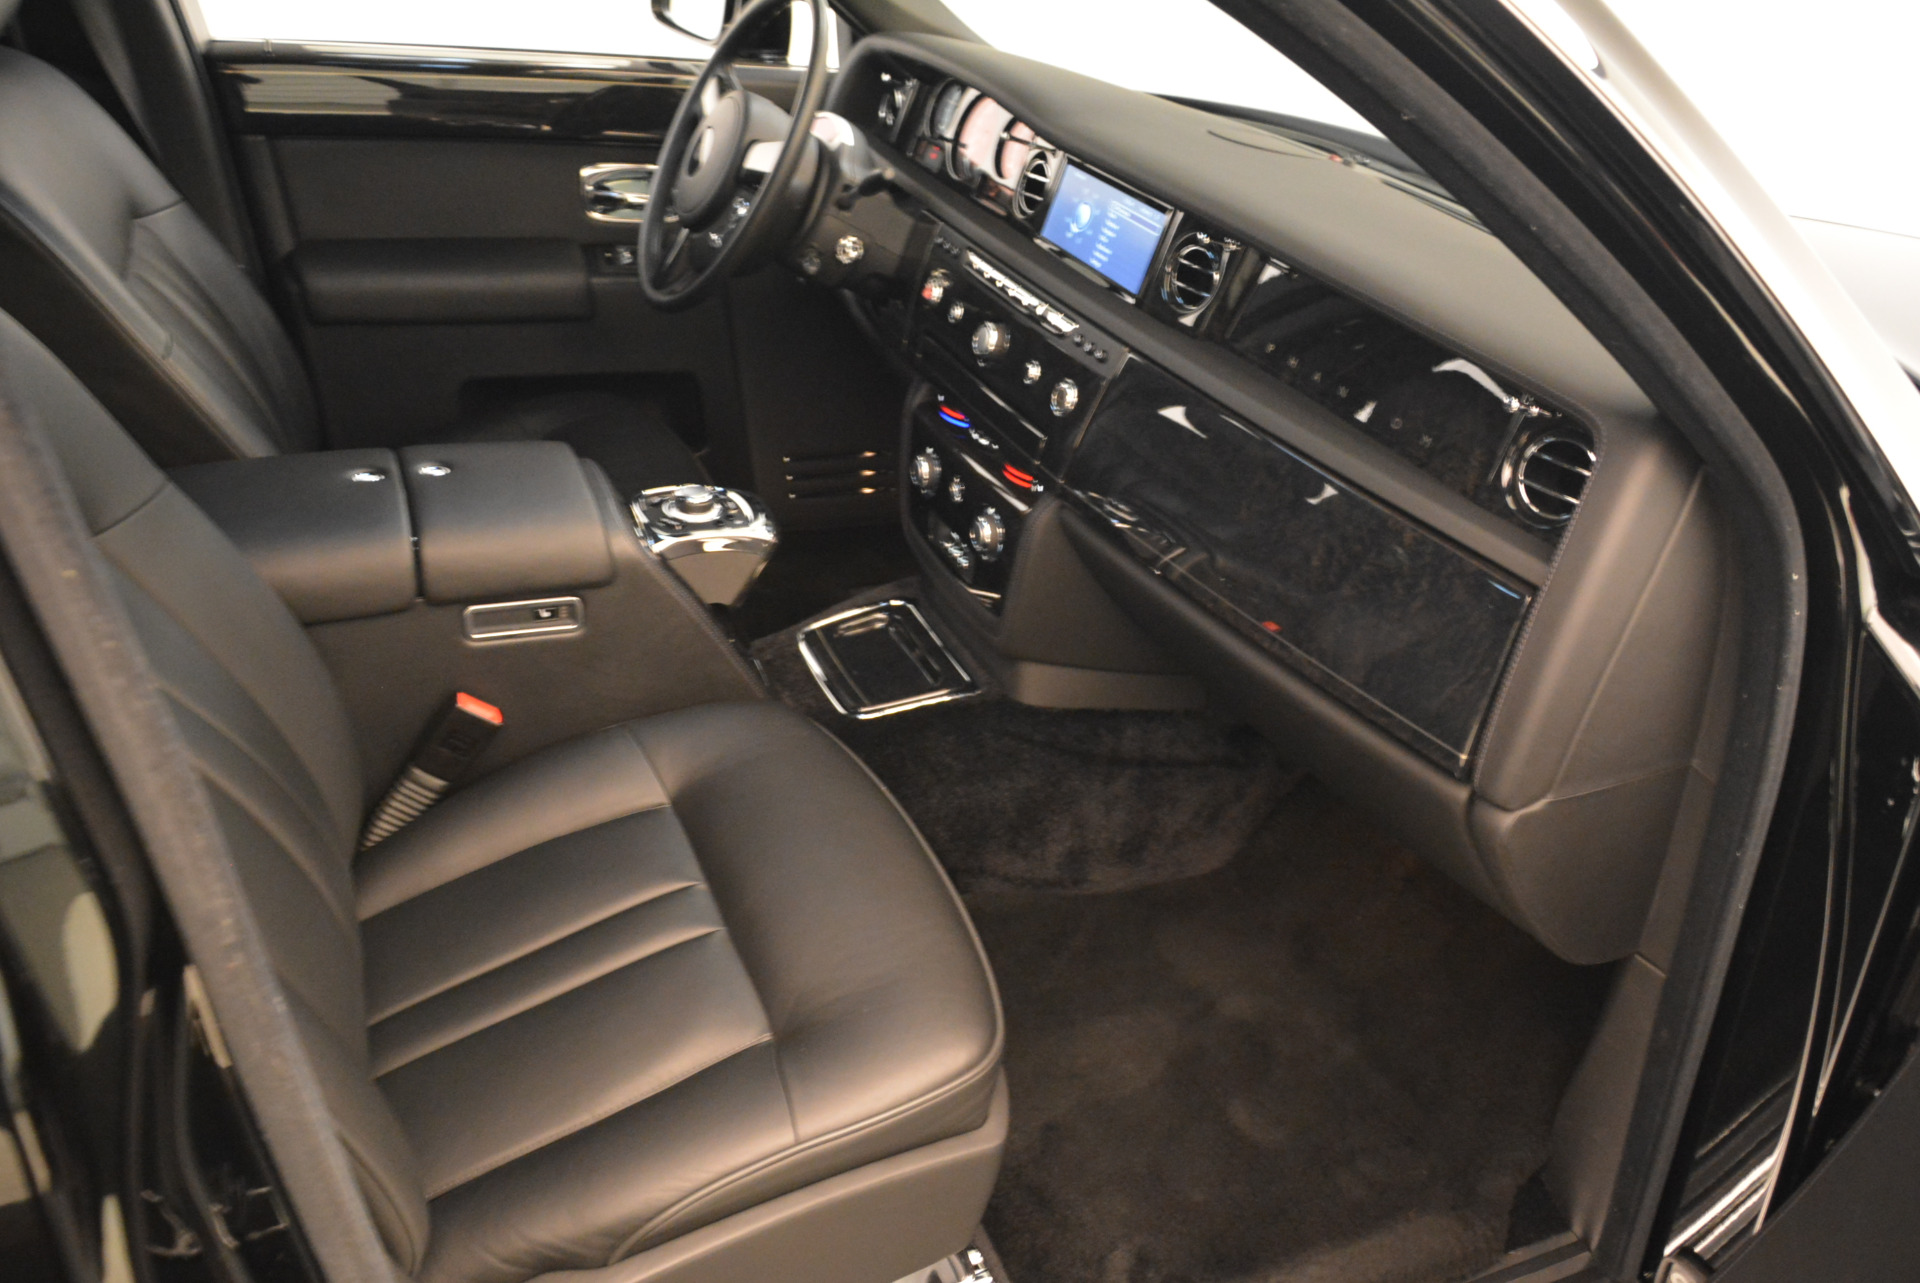 Used 2014 Rolls-Royce Phantom EWB For Sale In Greenwich, CT. Alfa Romeo of Greenwich, 7319 2051_p22